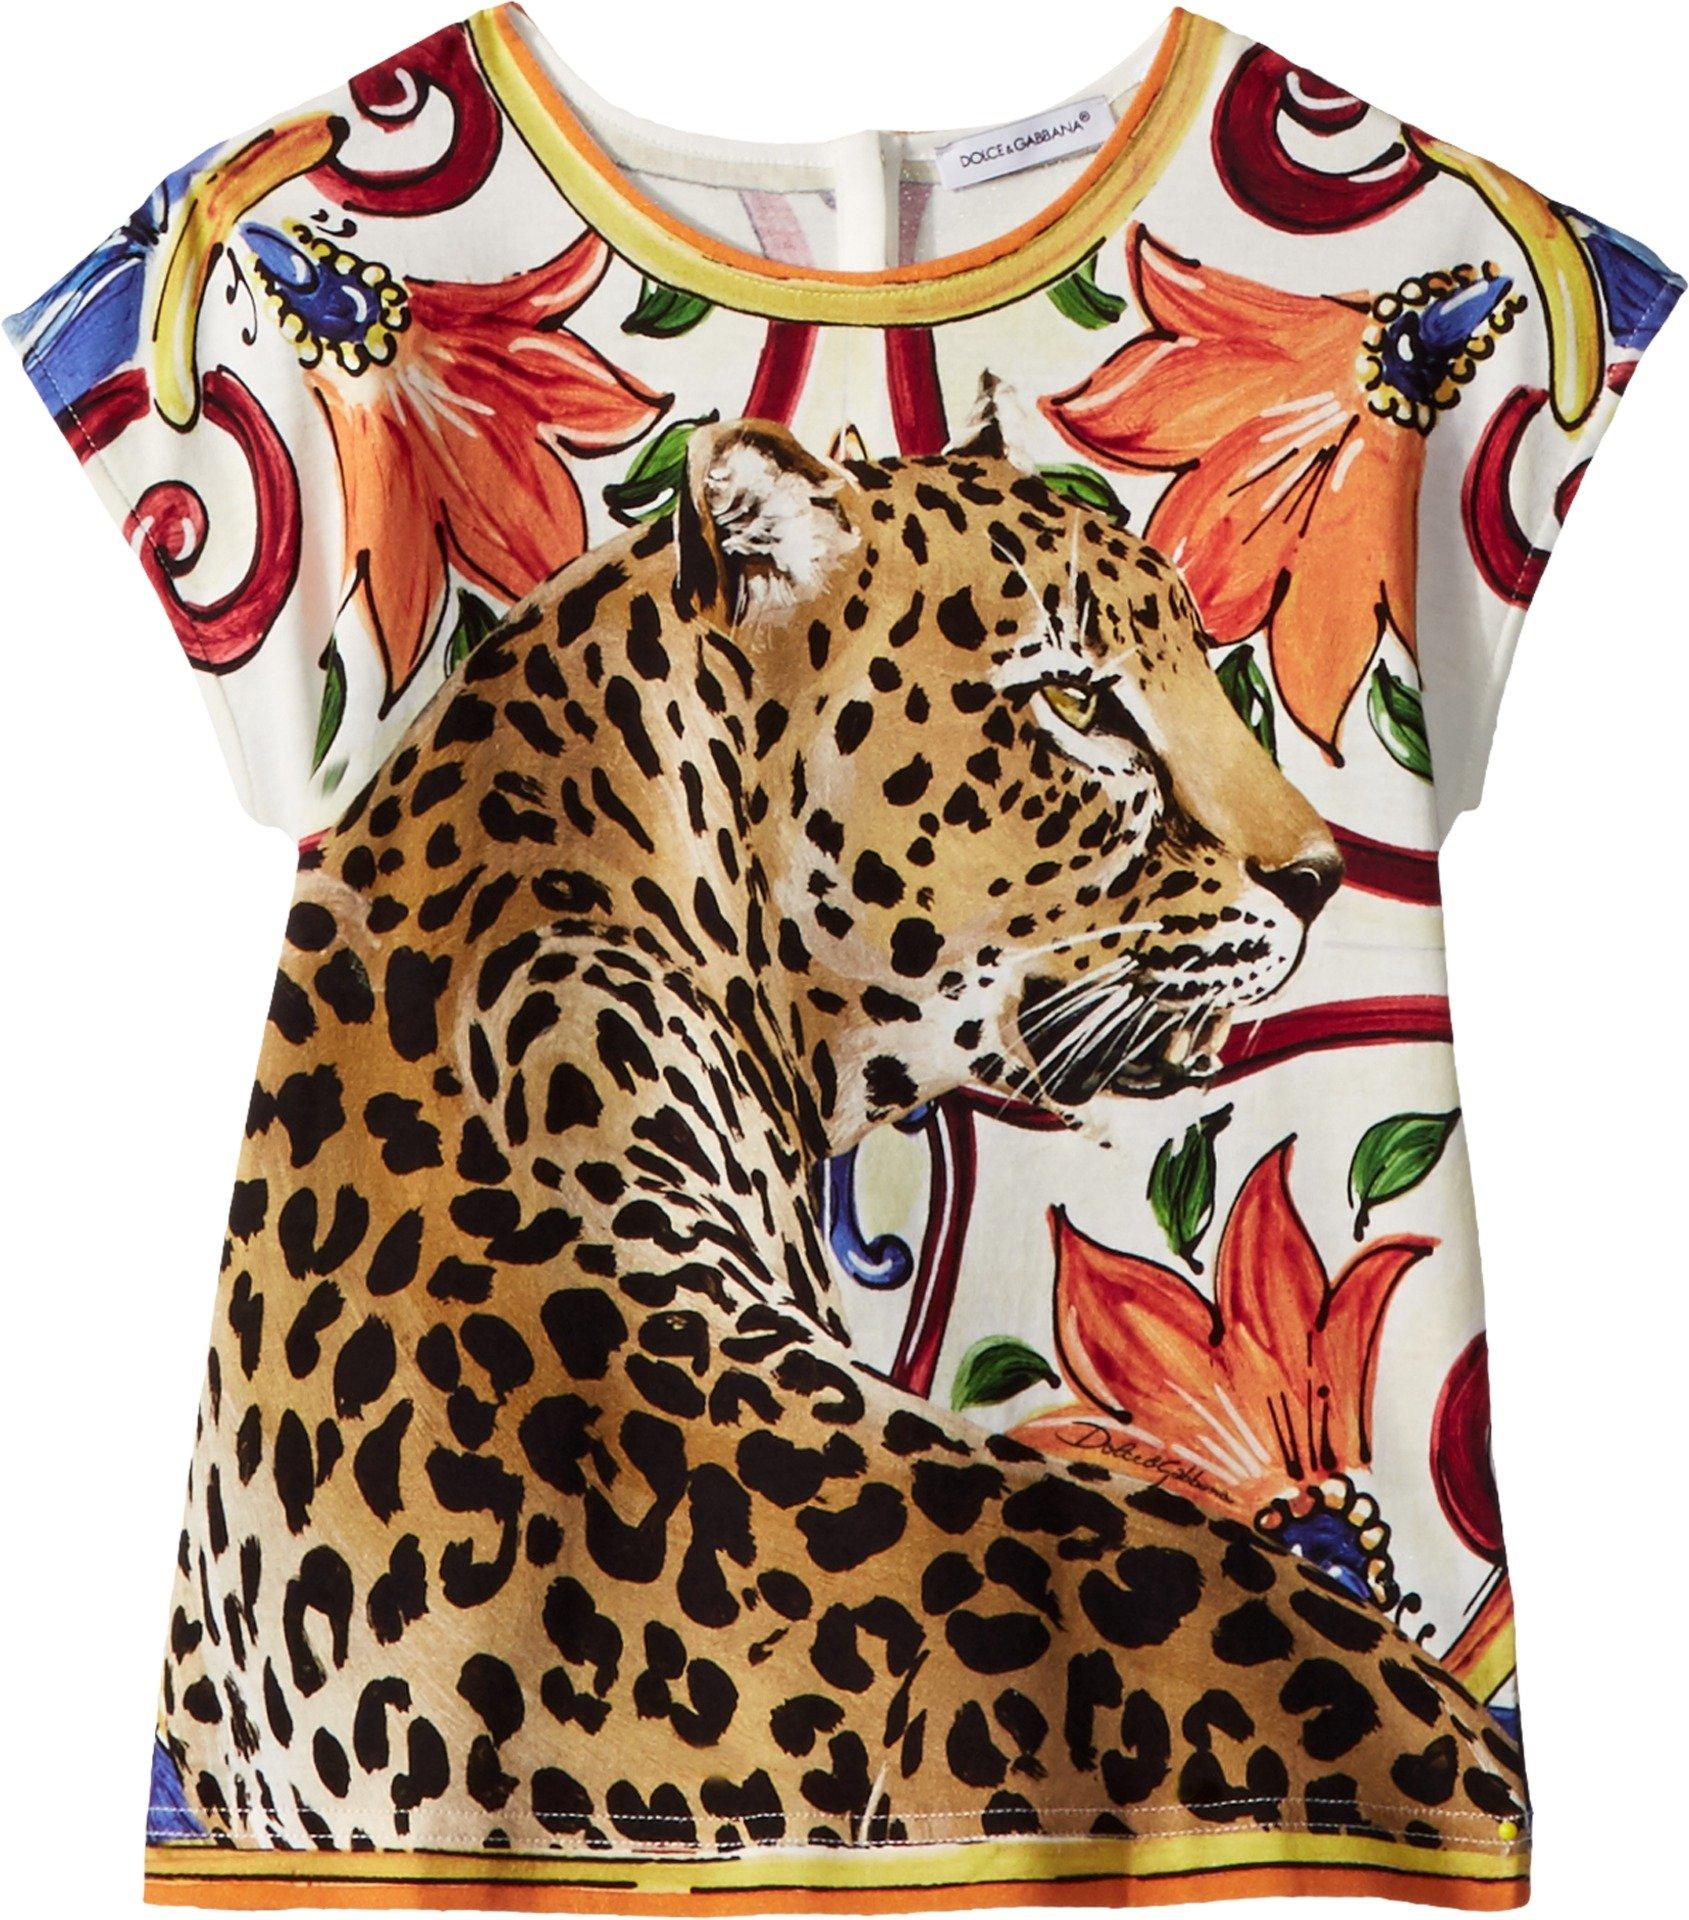 Dolce & Gabbana Kids Baby Girl's T-Shirt (Toddler/Little Kids) Natural Print 5